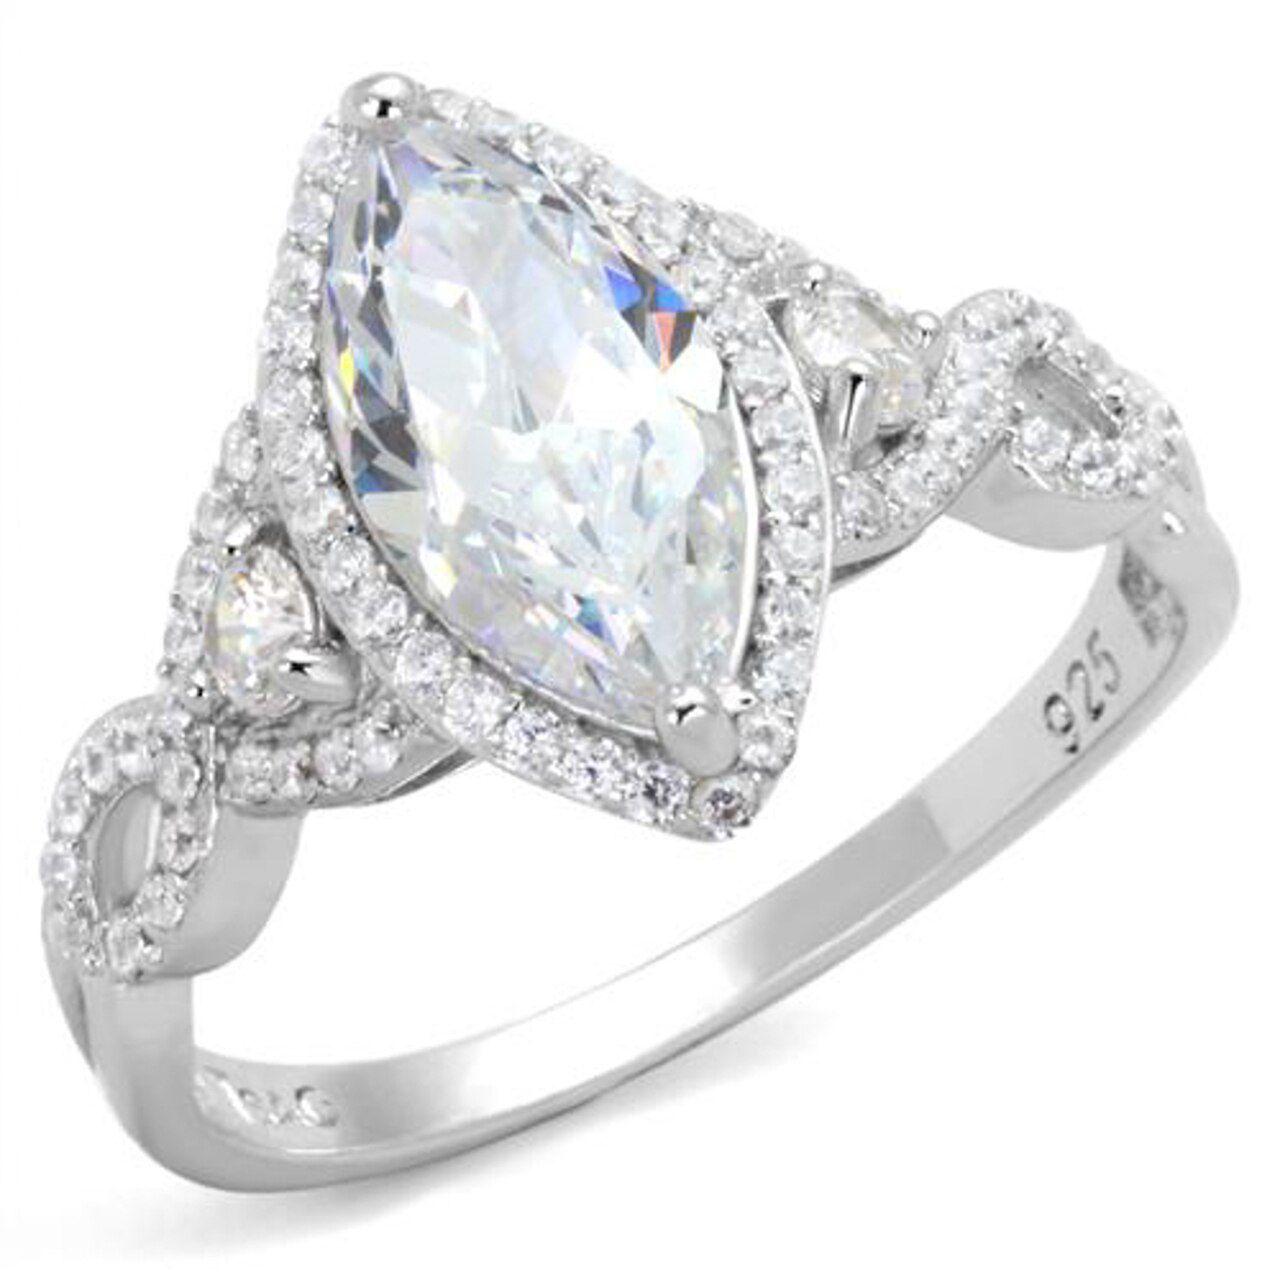 Marimor Marquise Engagement Ring